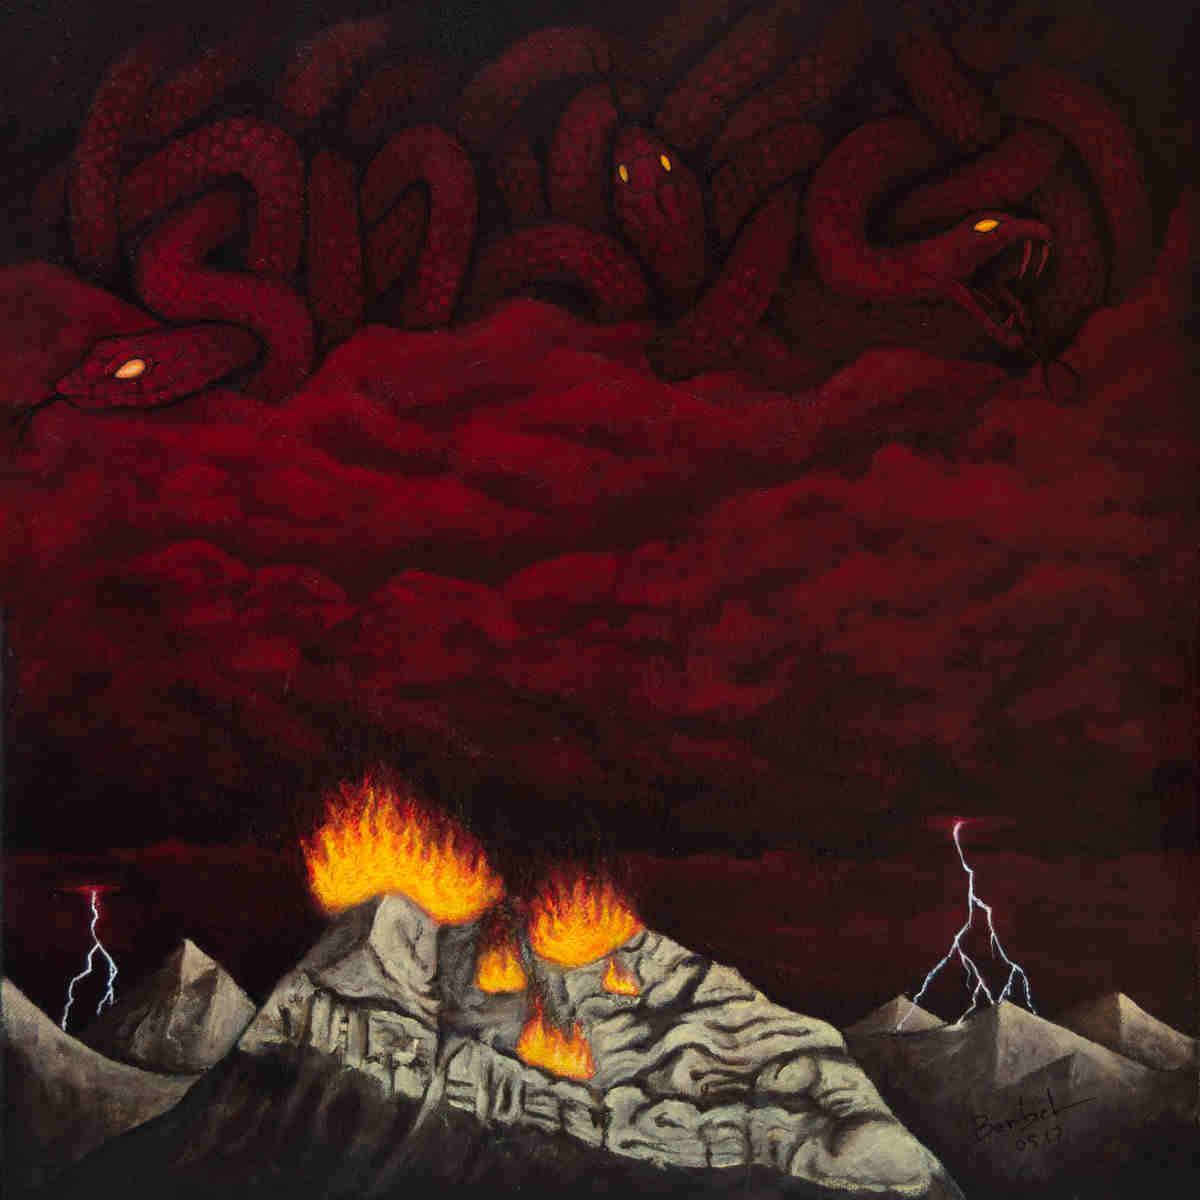 Epitaphe – Demo MMXVII 4/6